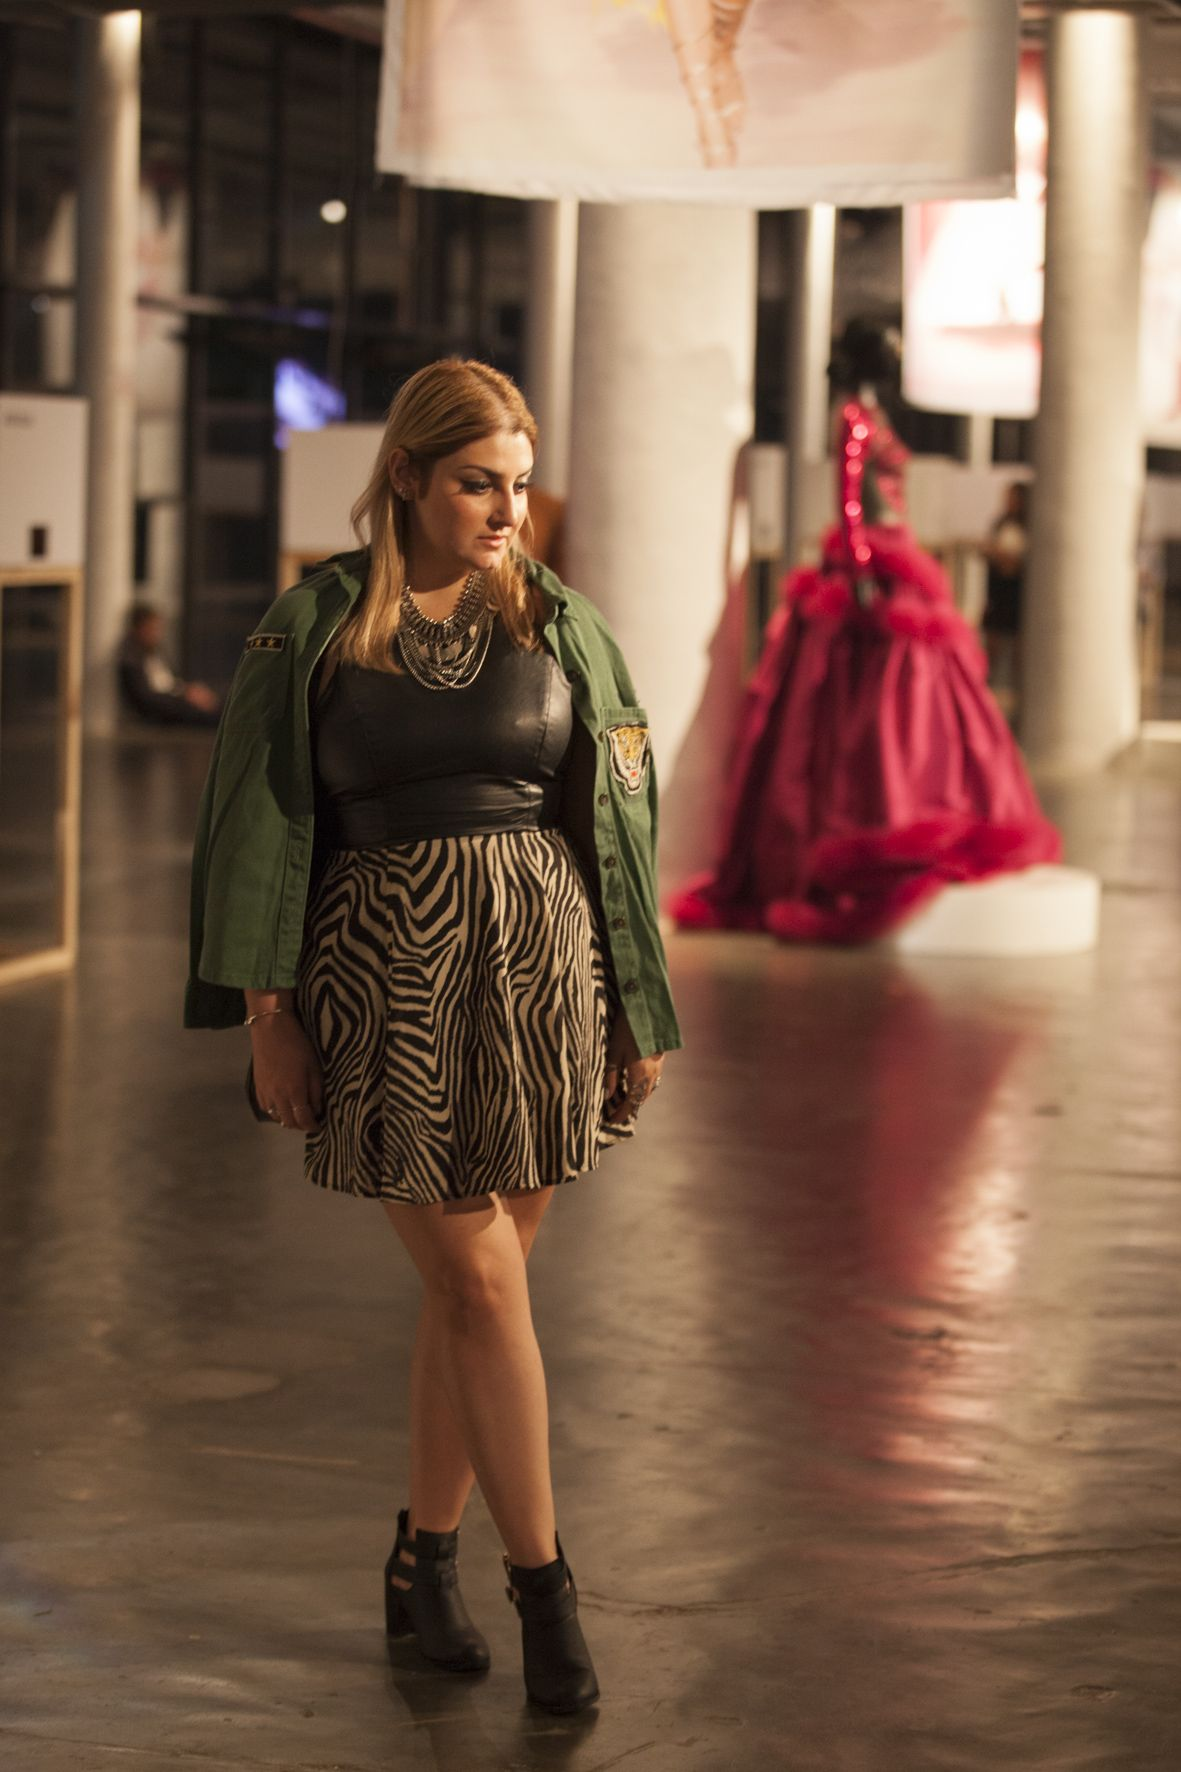 Os meus looks da São Paulo Fashion Week. Confira! | Looks